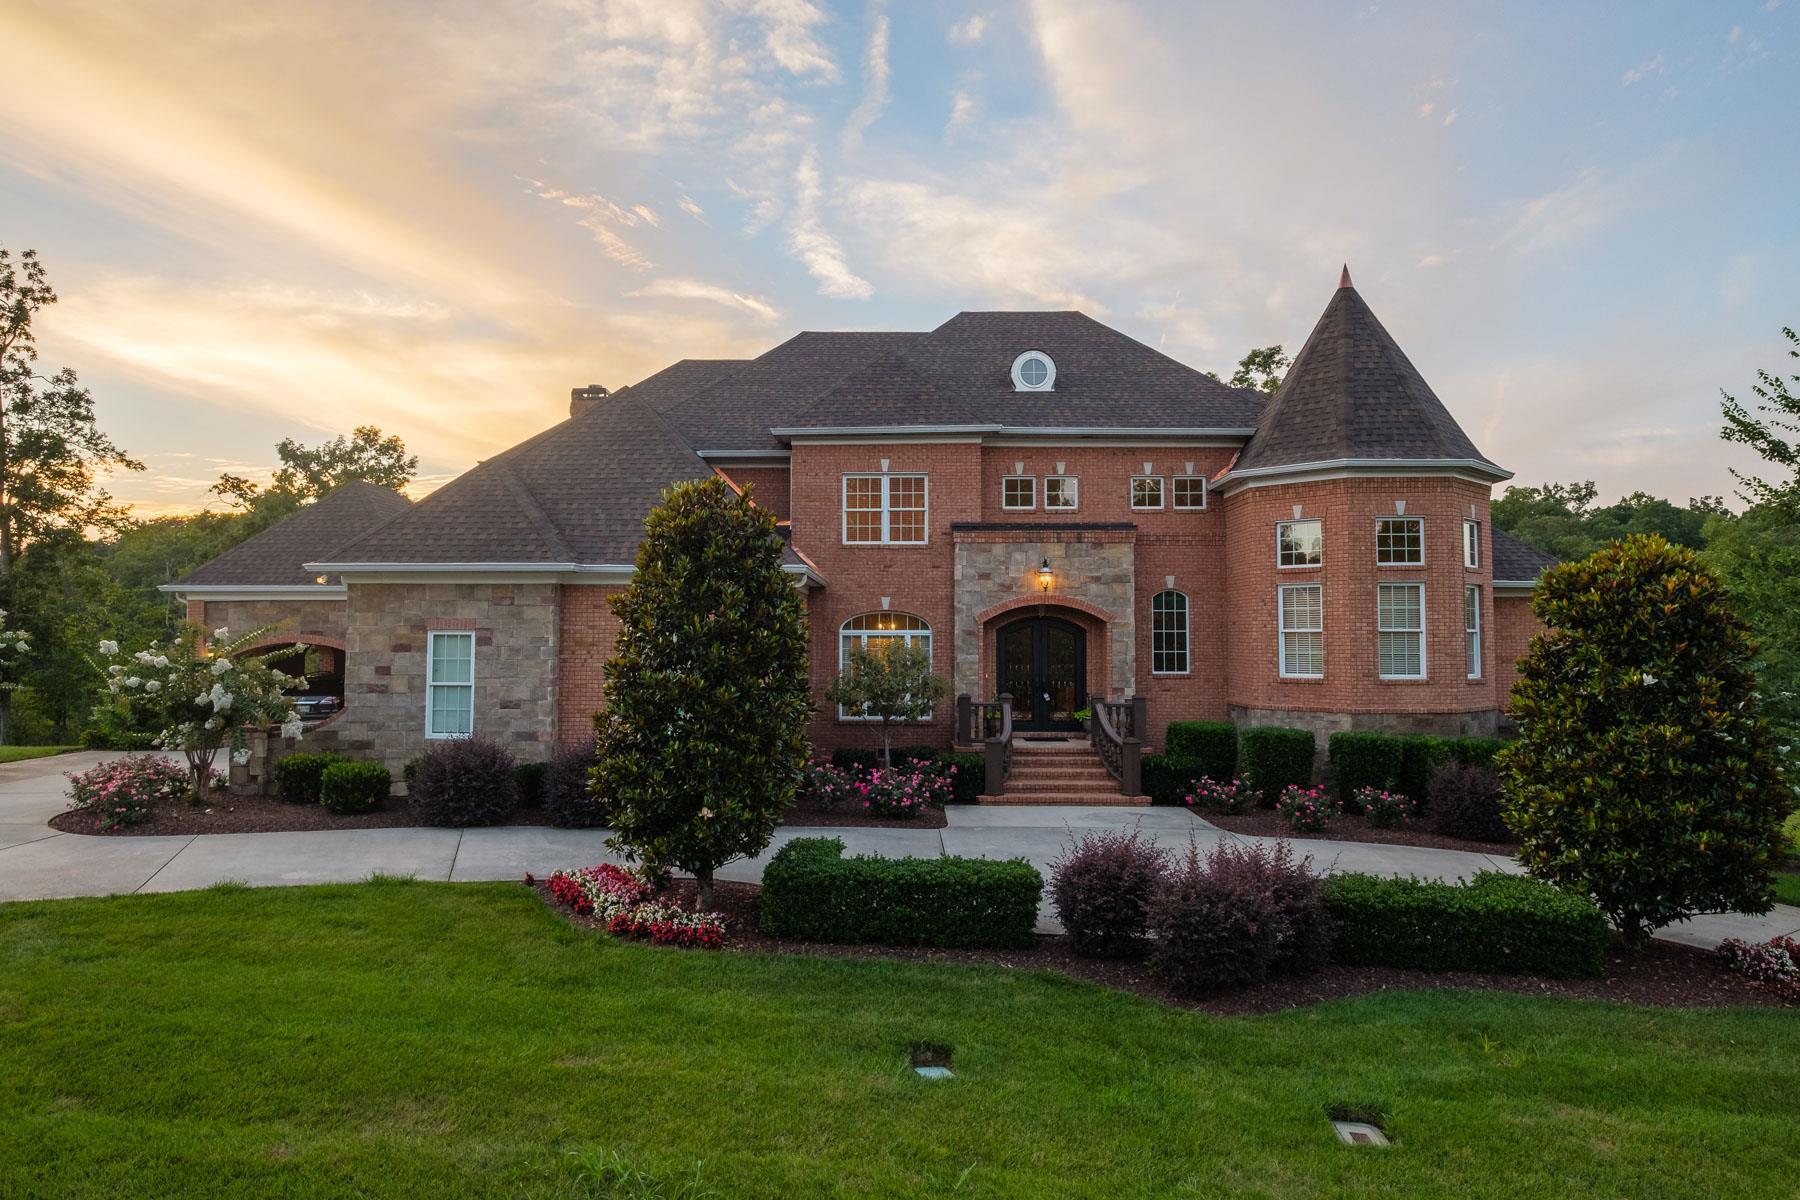 203 SETTERS LANE E, Tullahoma, TN 37388 - Tullahoma, TN real estate listing